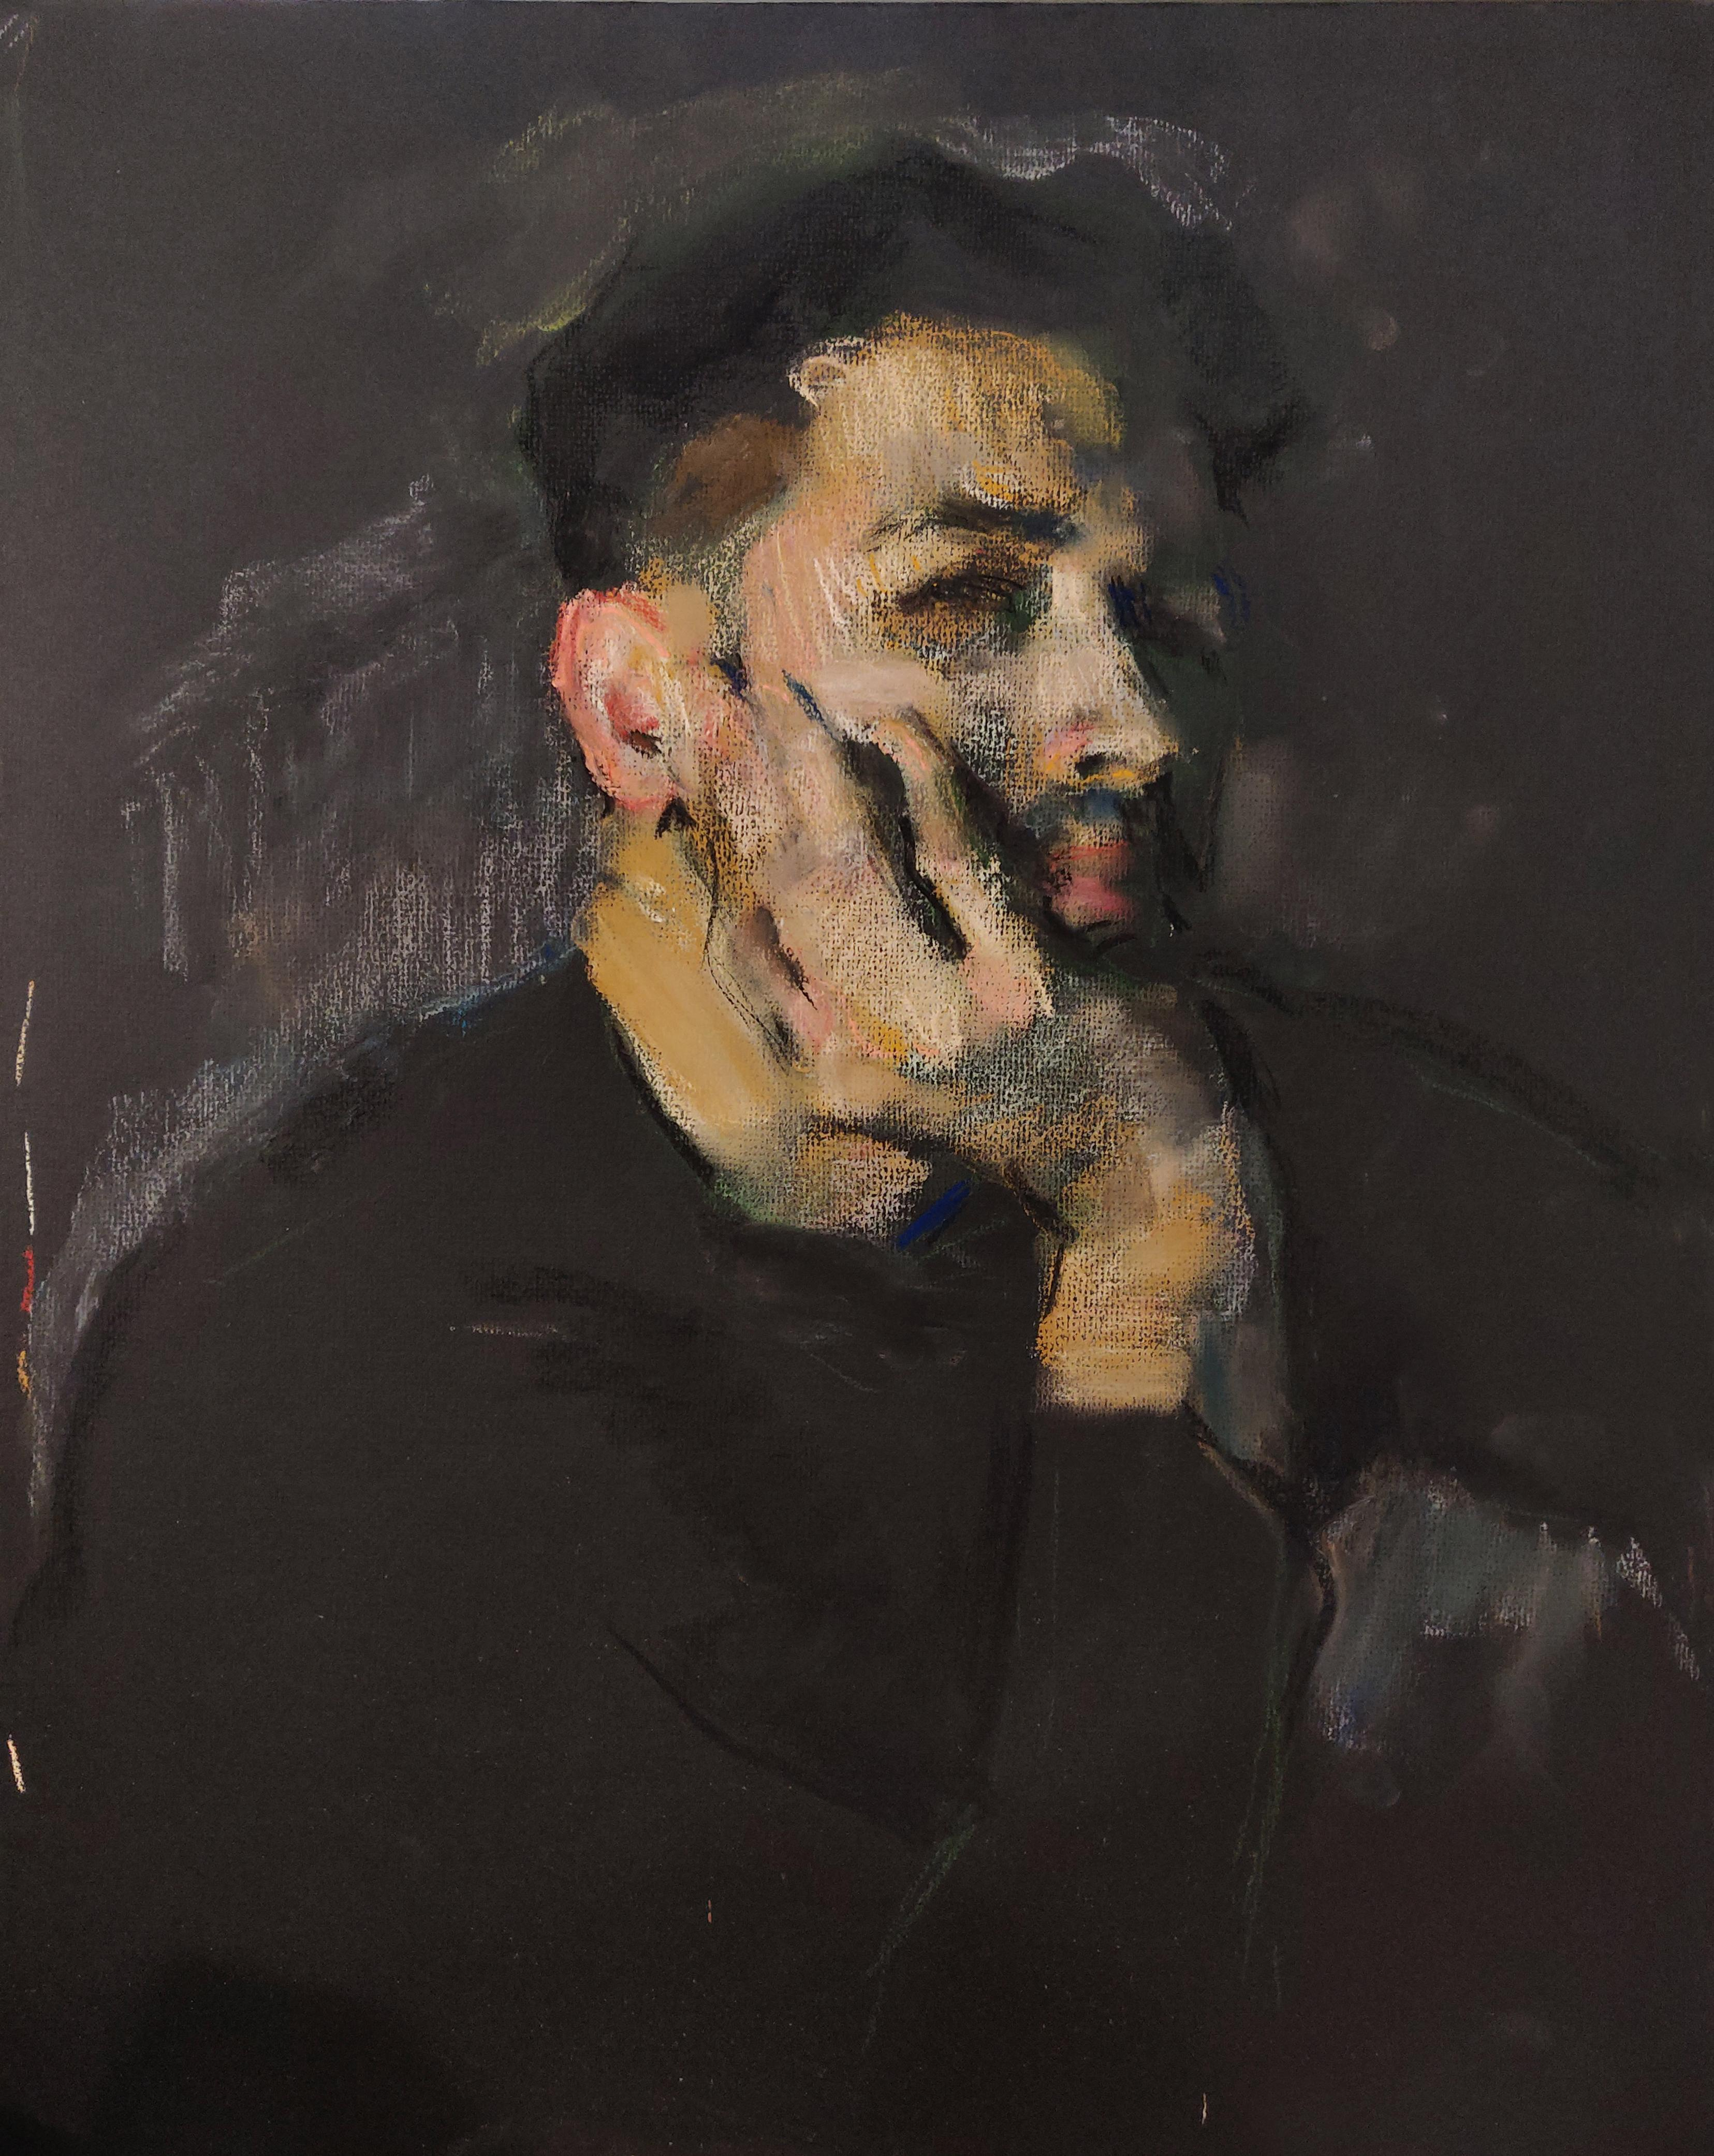 Self-Portrait - Samir Rakhmanov 21st Century Contemporary Pastel Master Drawing